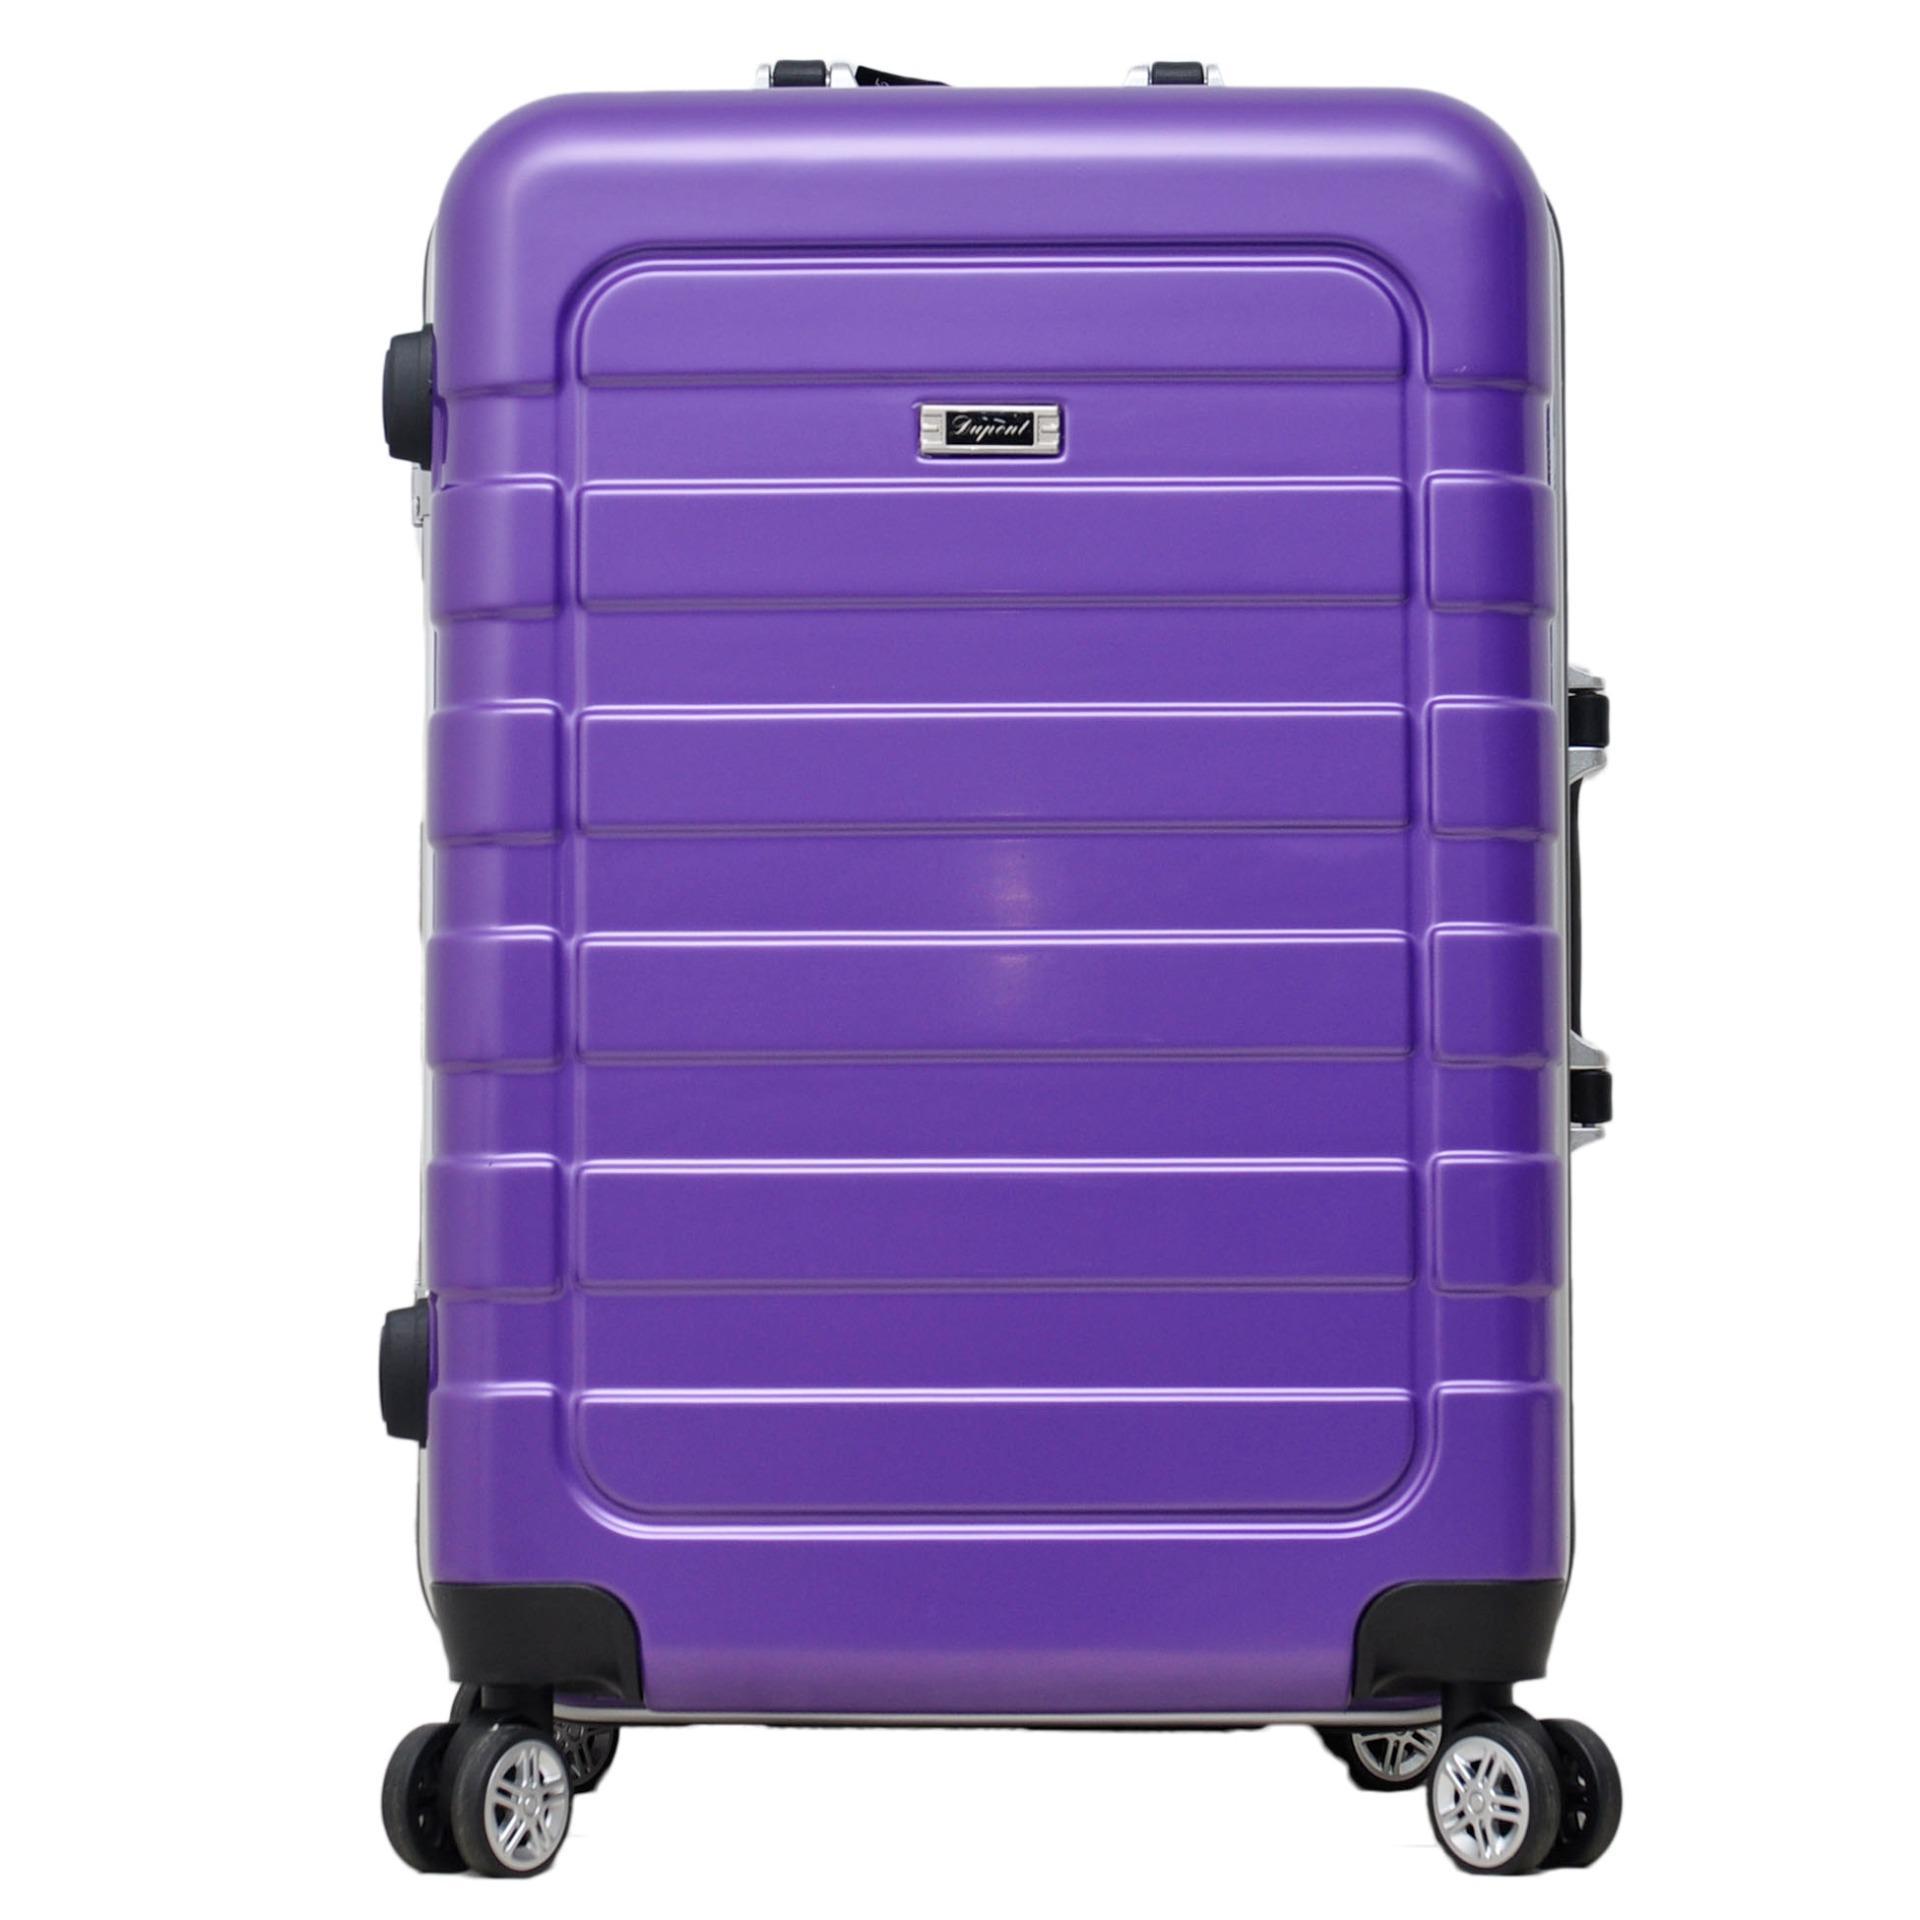 Beli Dupont Koper Hardcase No Zipper Size 24 Inch 8775 Ungu Pake Kartu Kredit